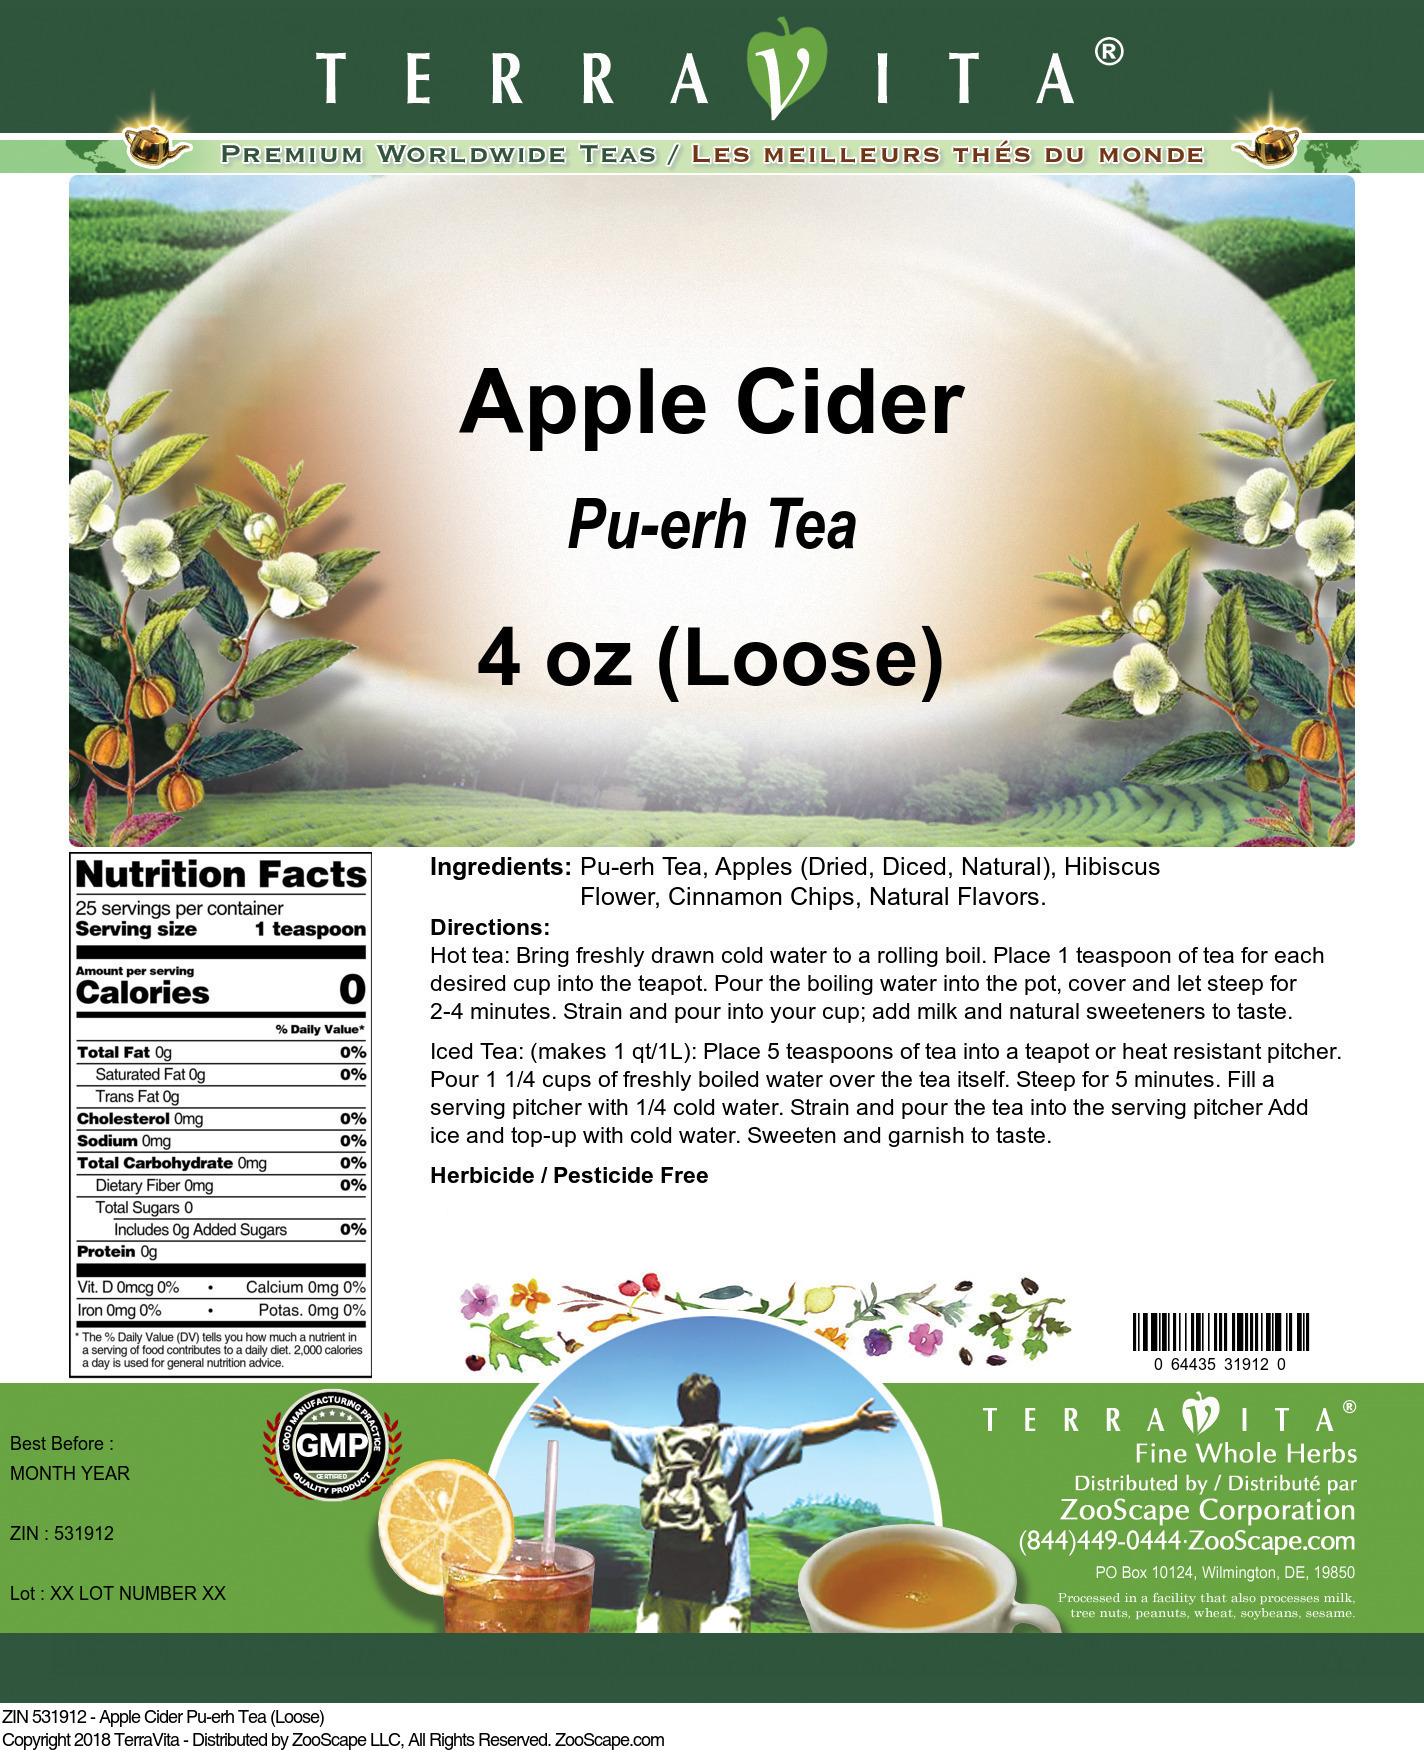 Apple Cider Pu-erh Tea (Loose)